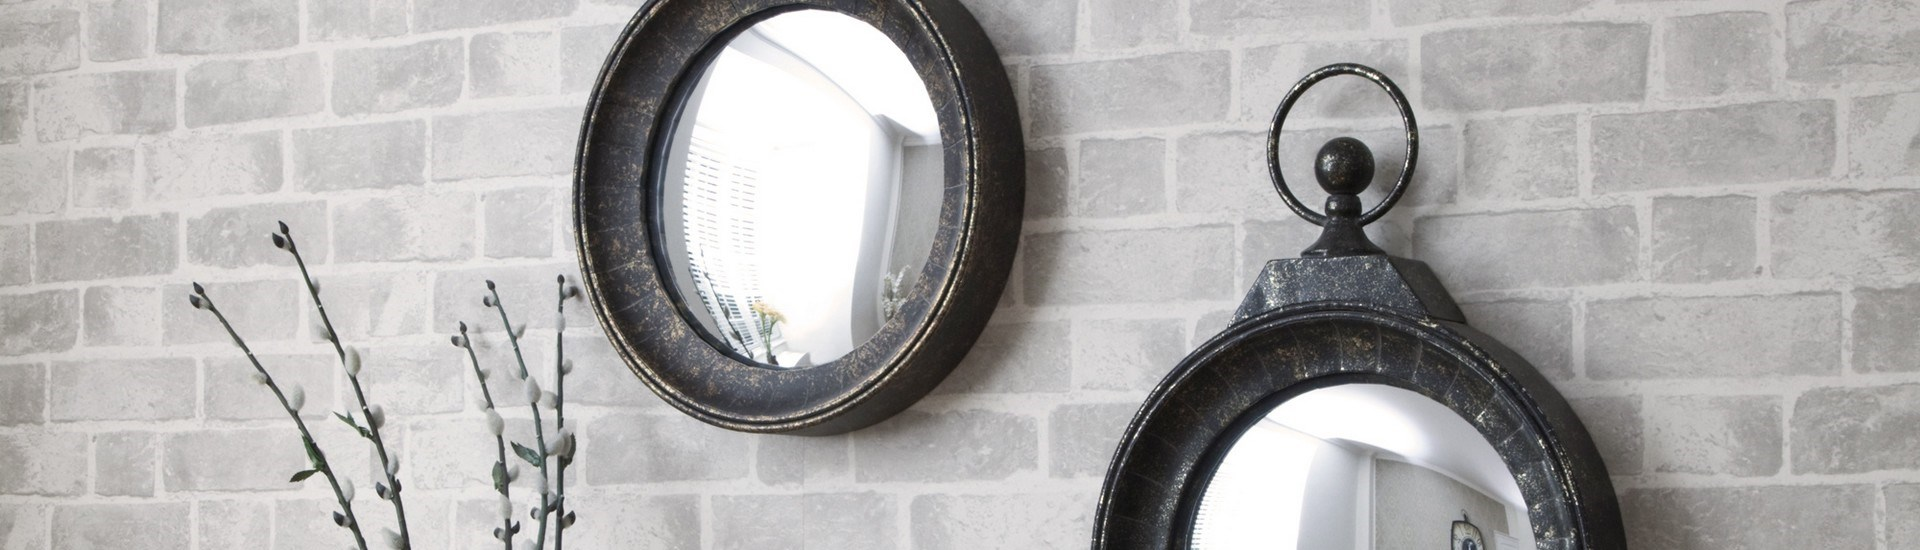 Top 5 Round Mirrors